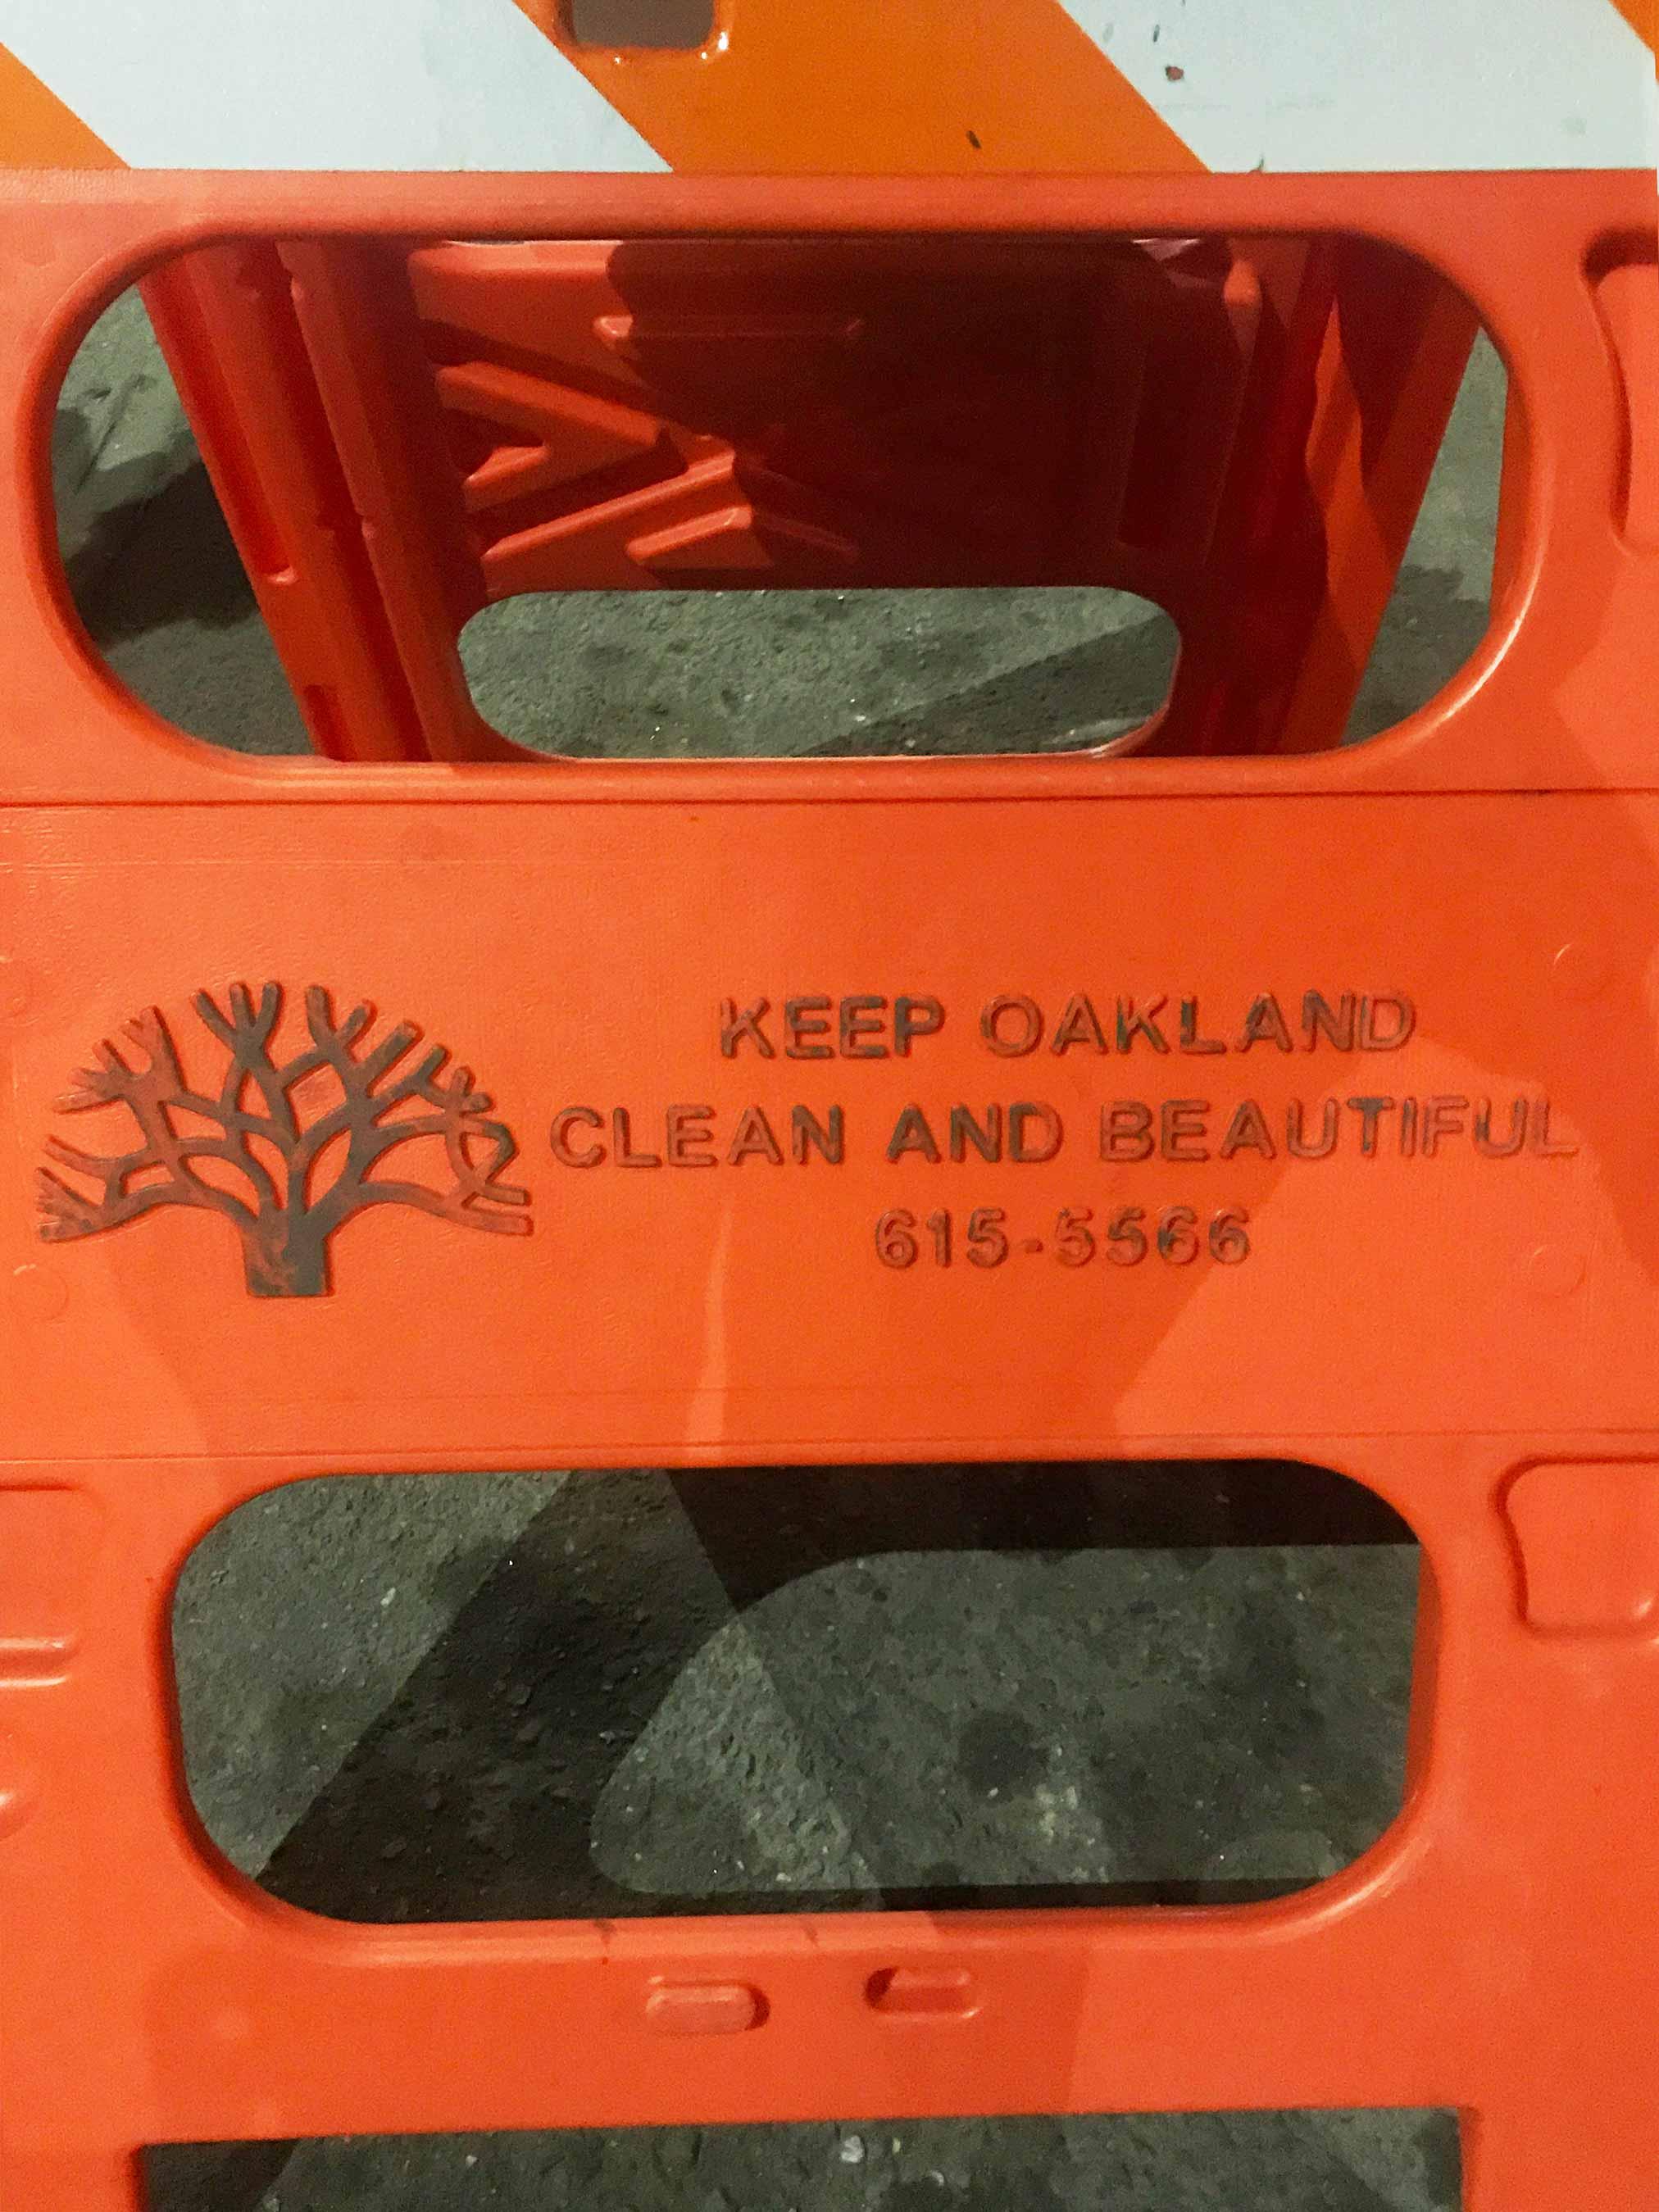 Oakland_Sign_Myles_Thompson_everpress_blog